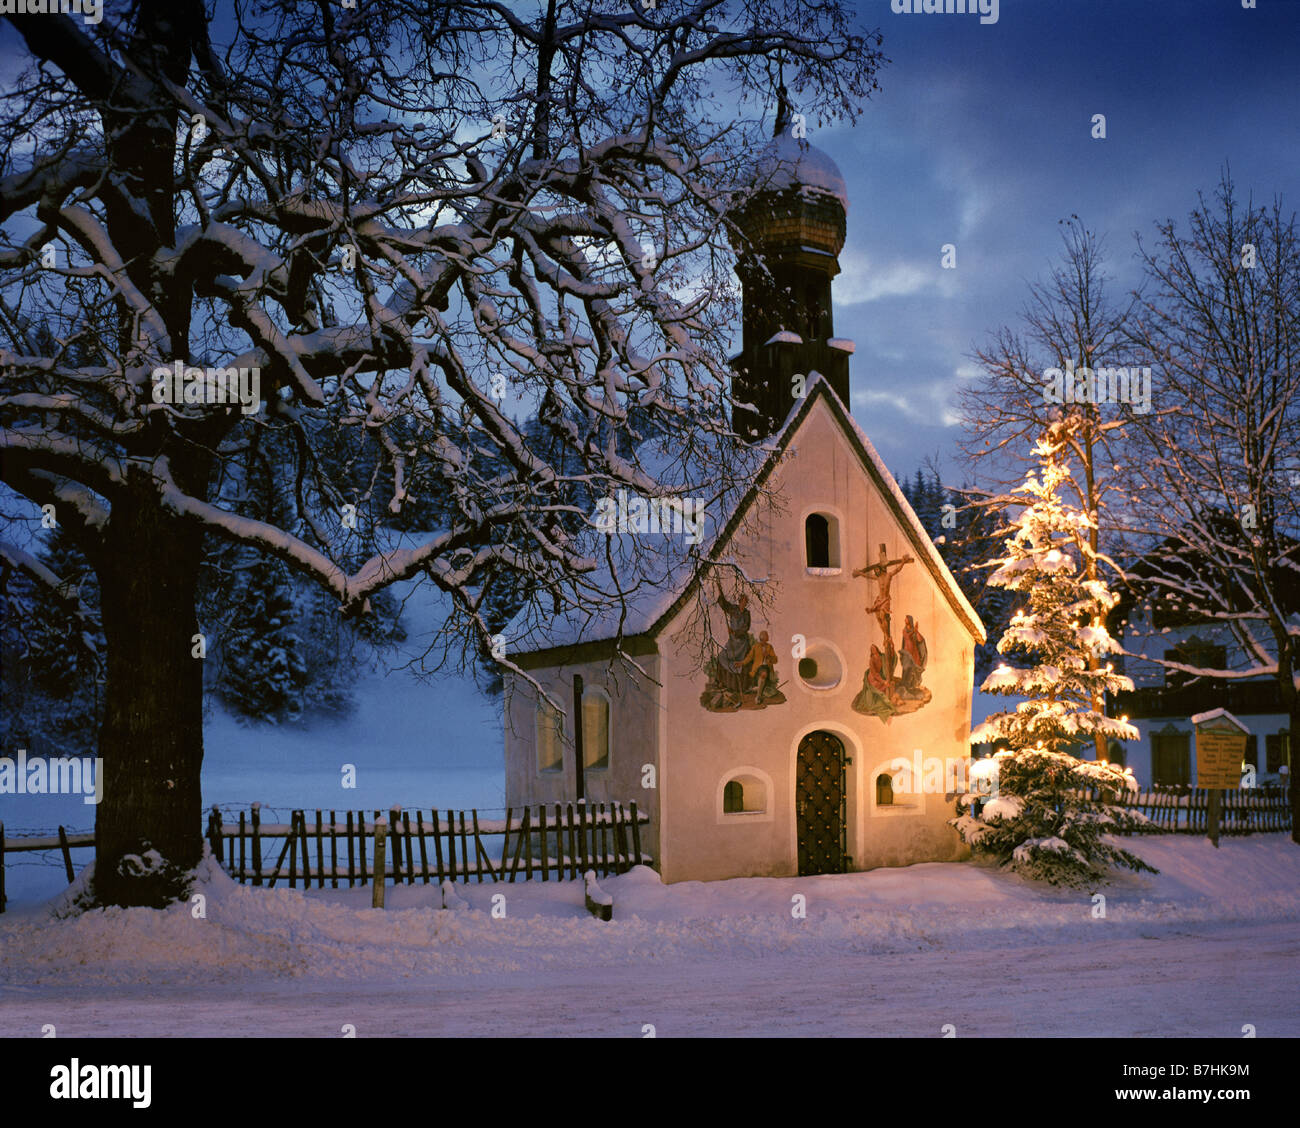 Where To Buy A Christmas Tree Near Me: BAVARIA: Christmas Scene At Klais Near Mittenwald